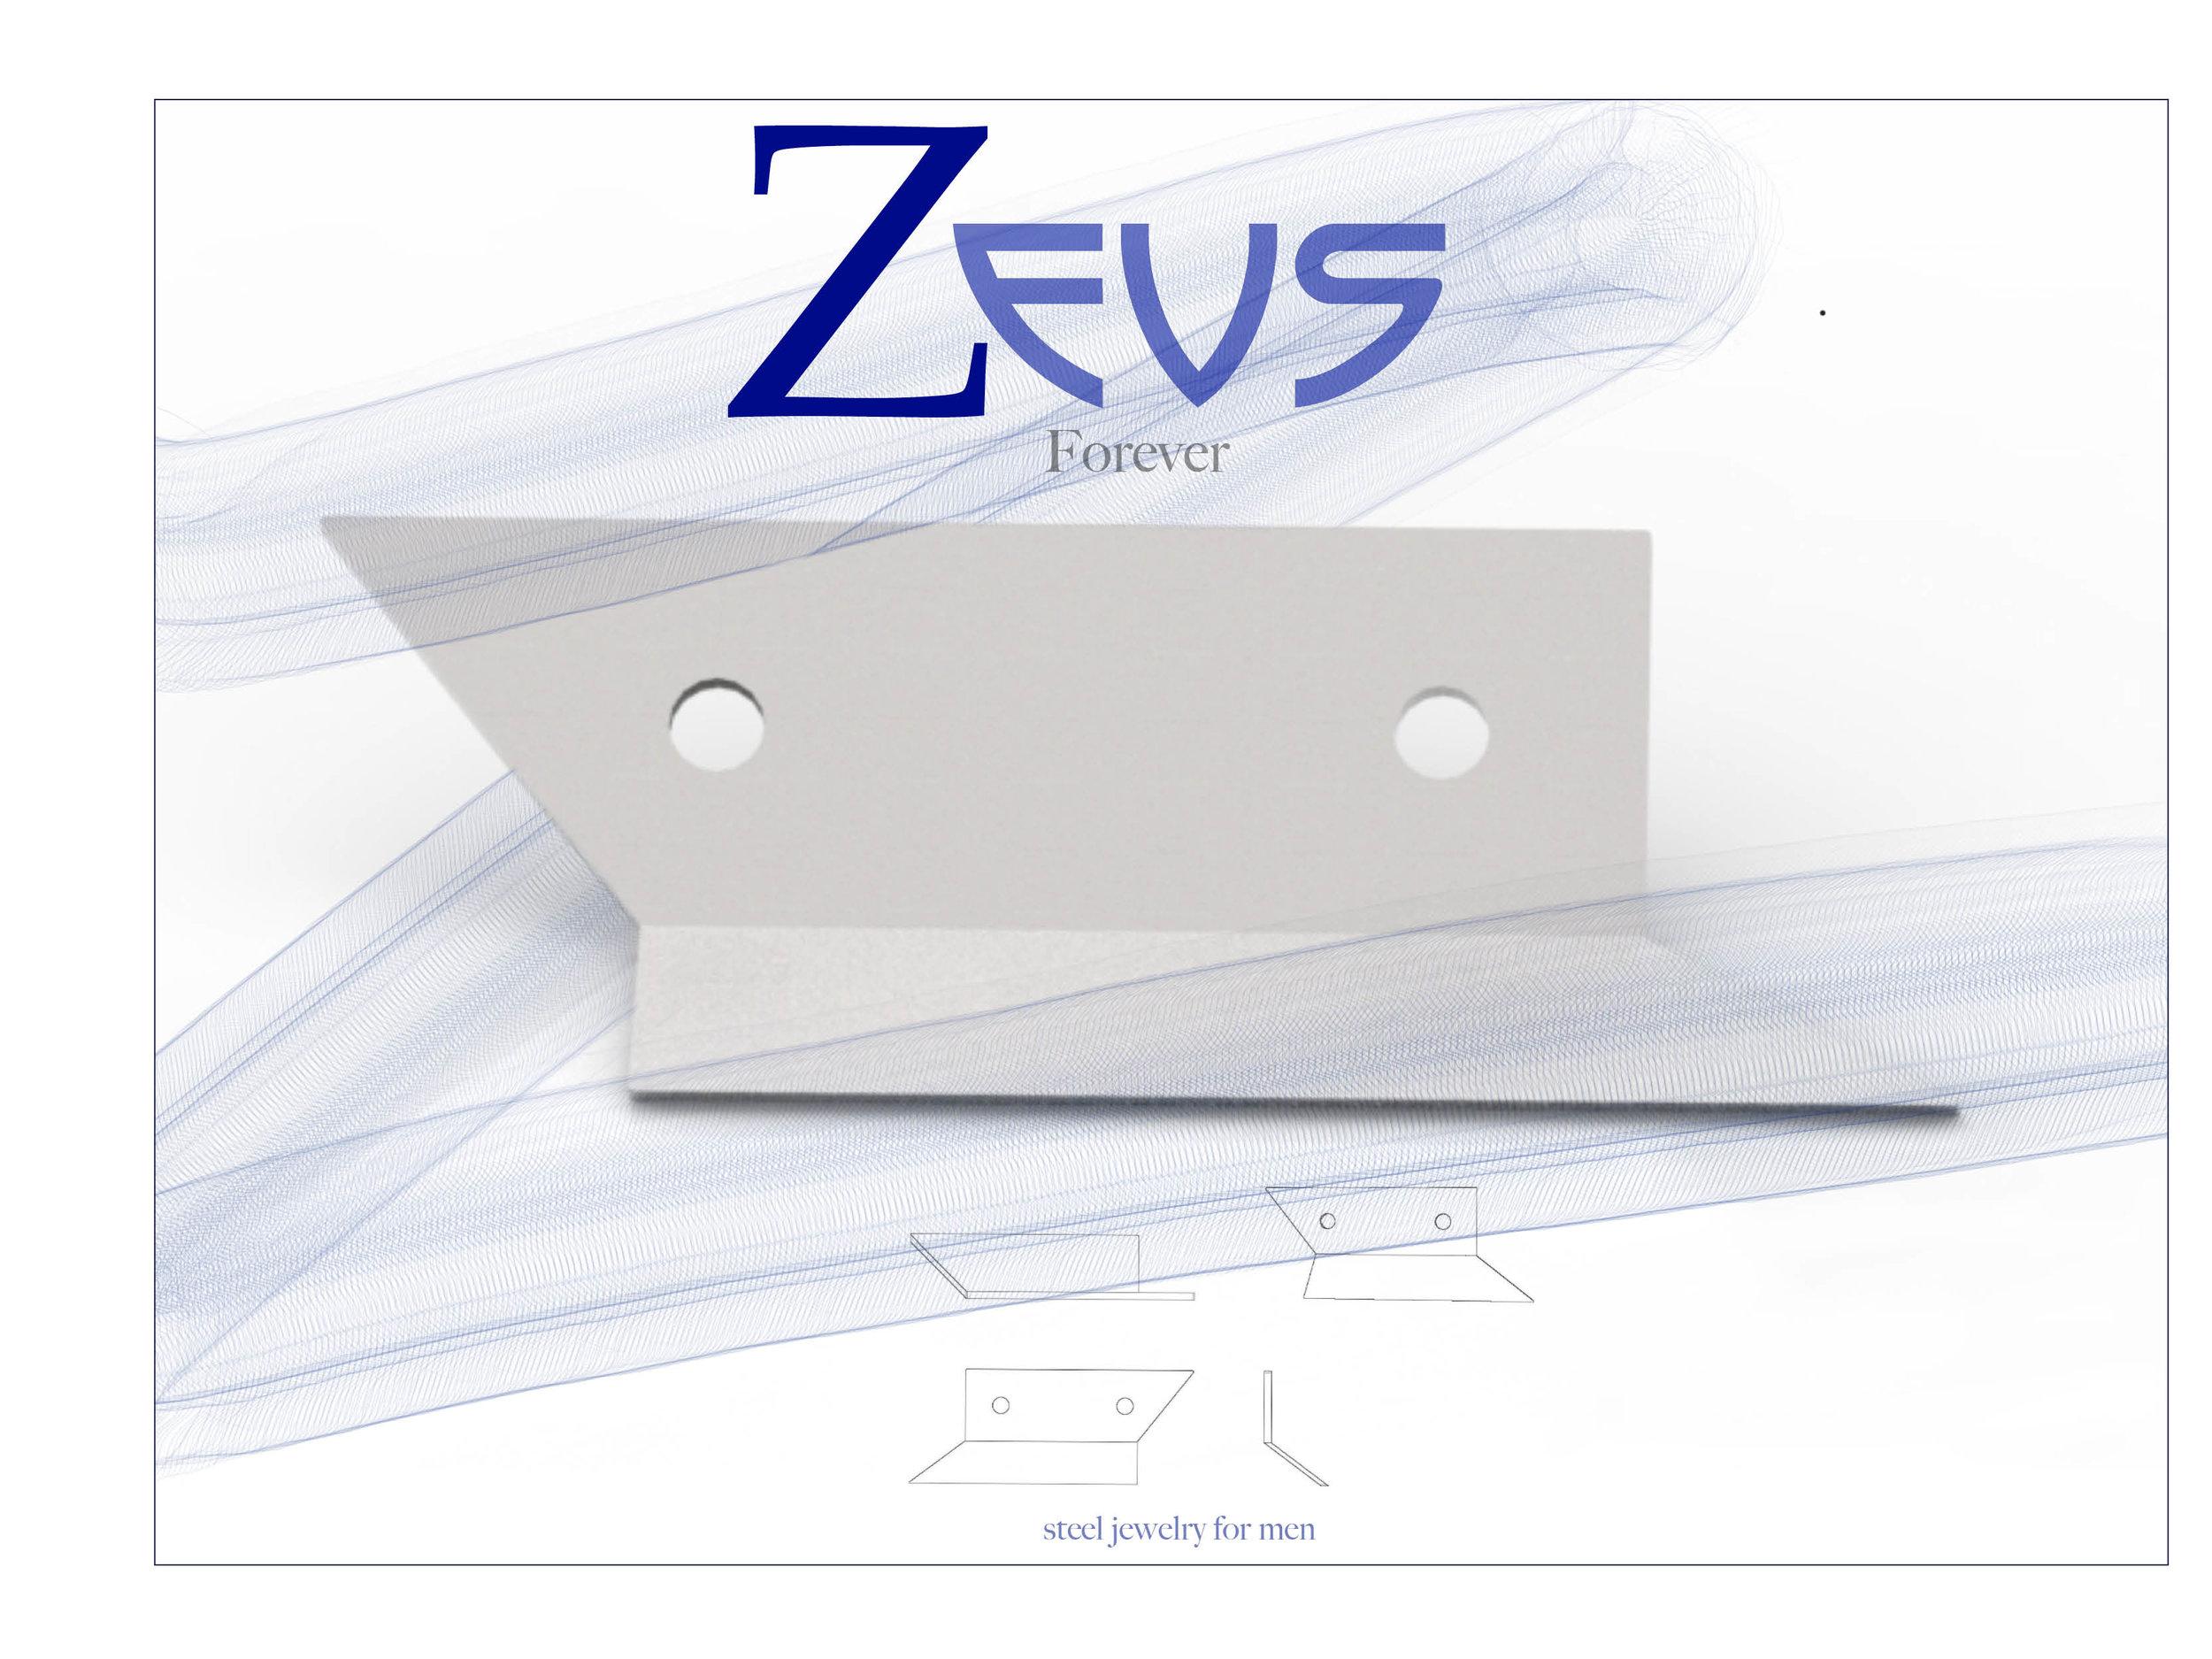 Z-jewlery hero2.jpg